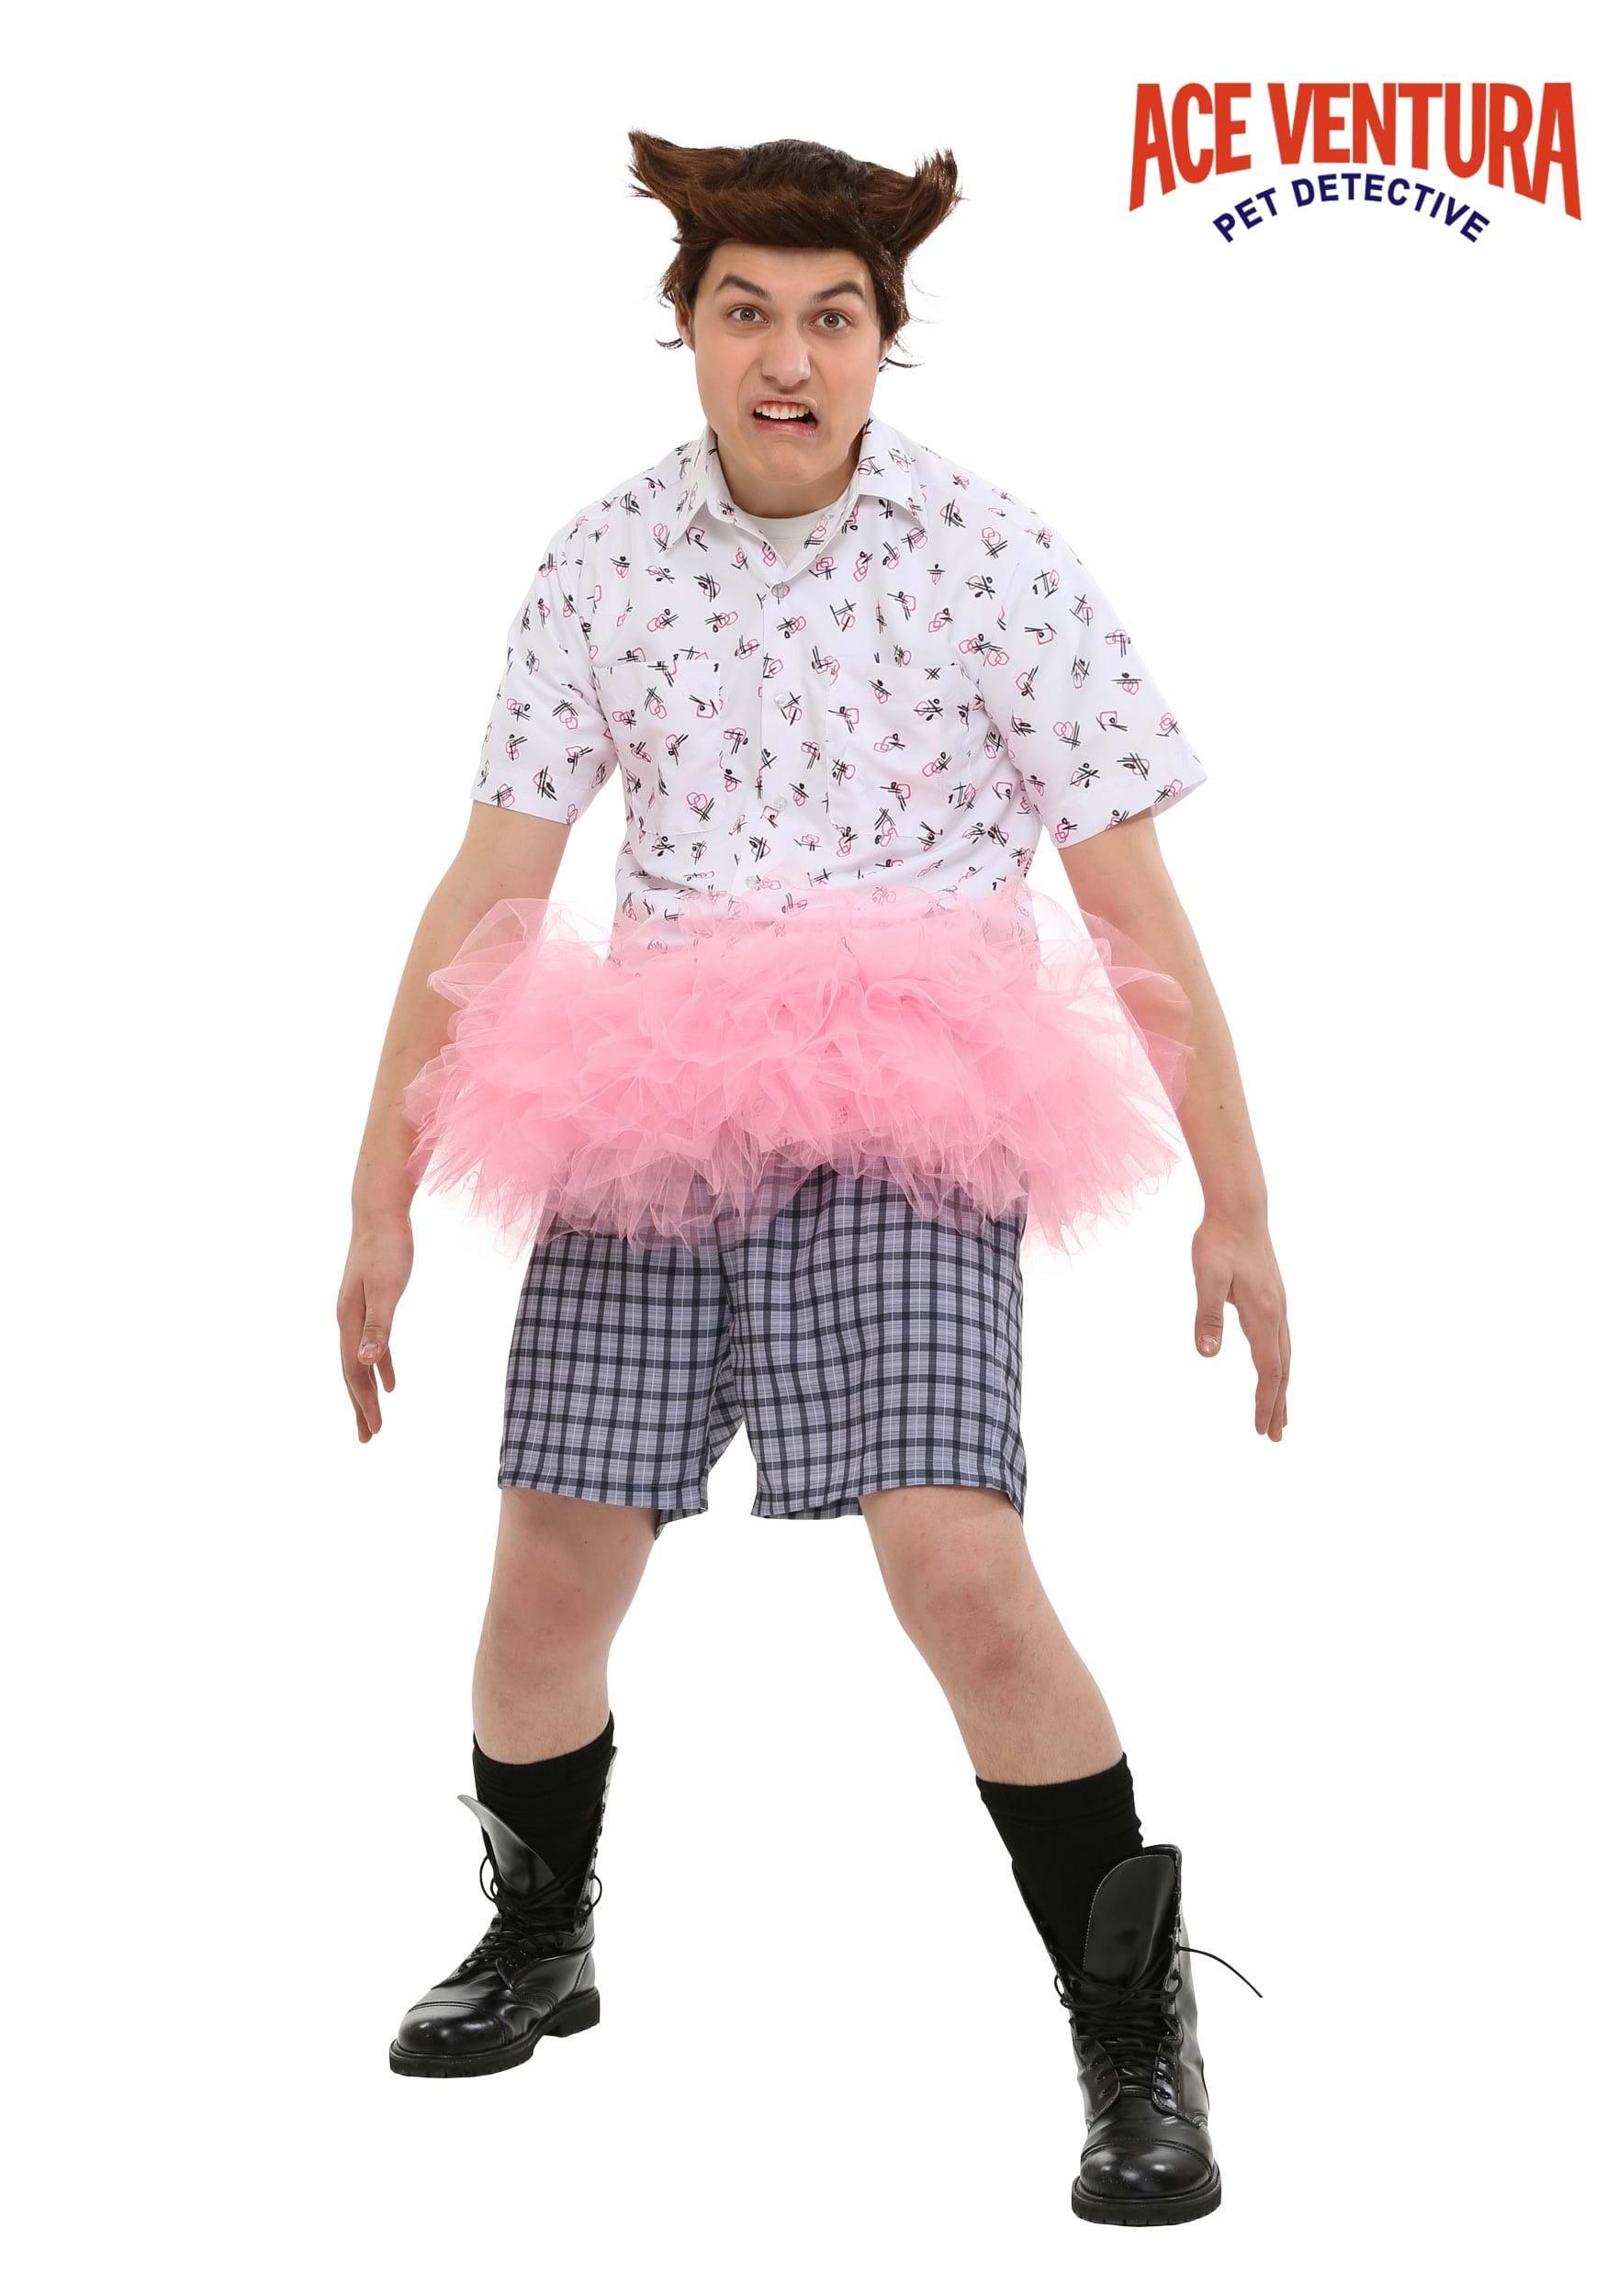 ace ventura tutu costume - Ace Ventura Halloween Costumes